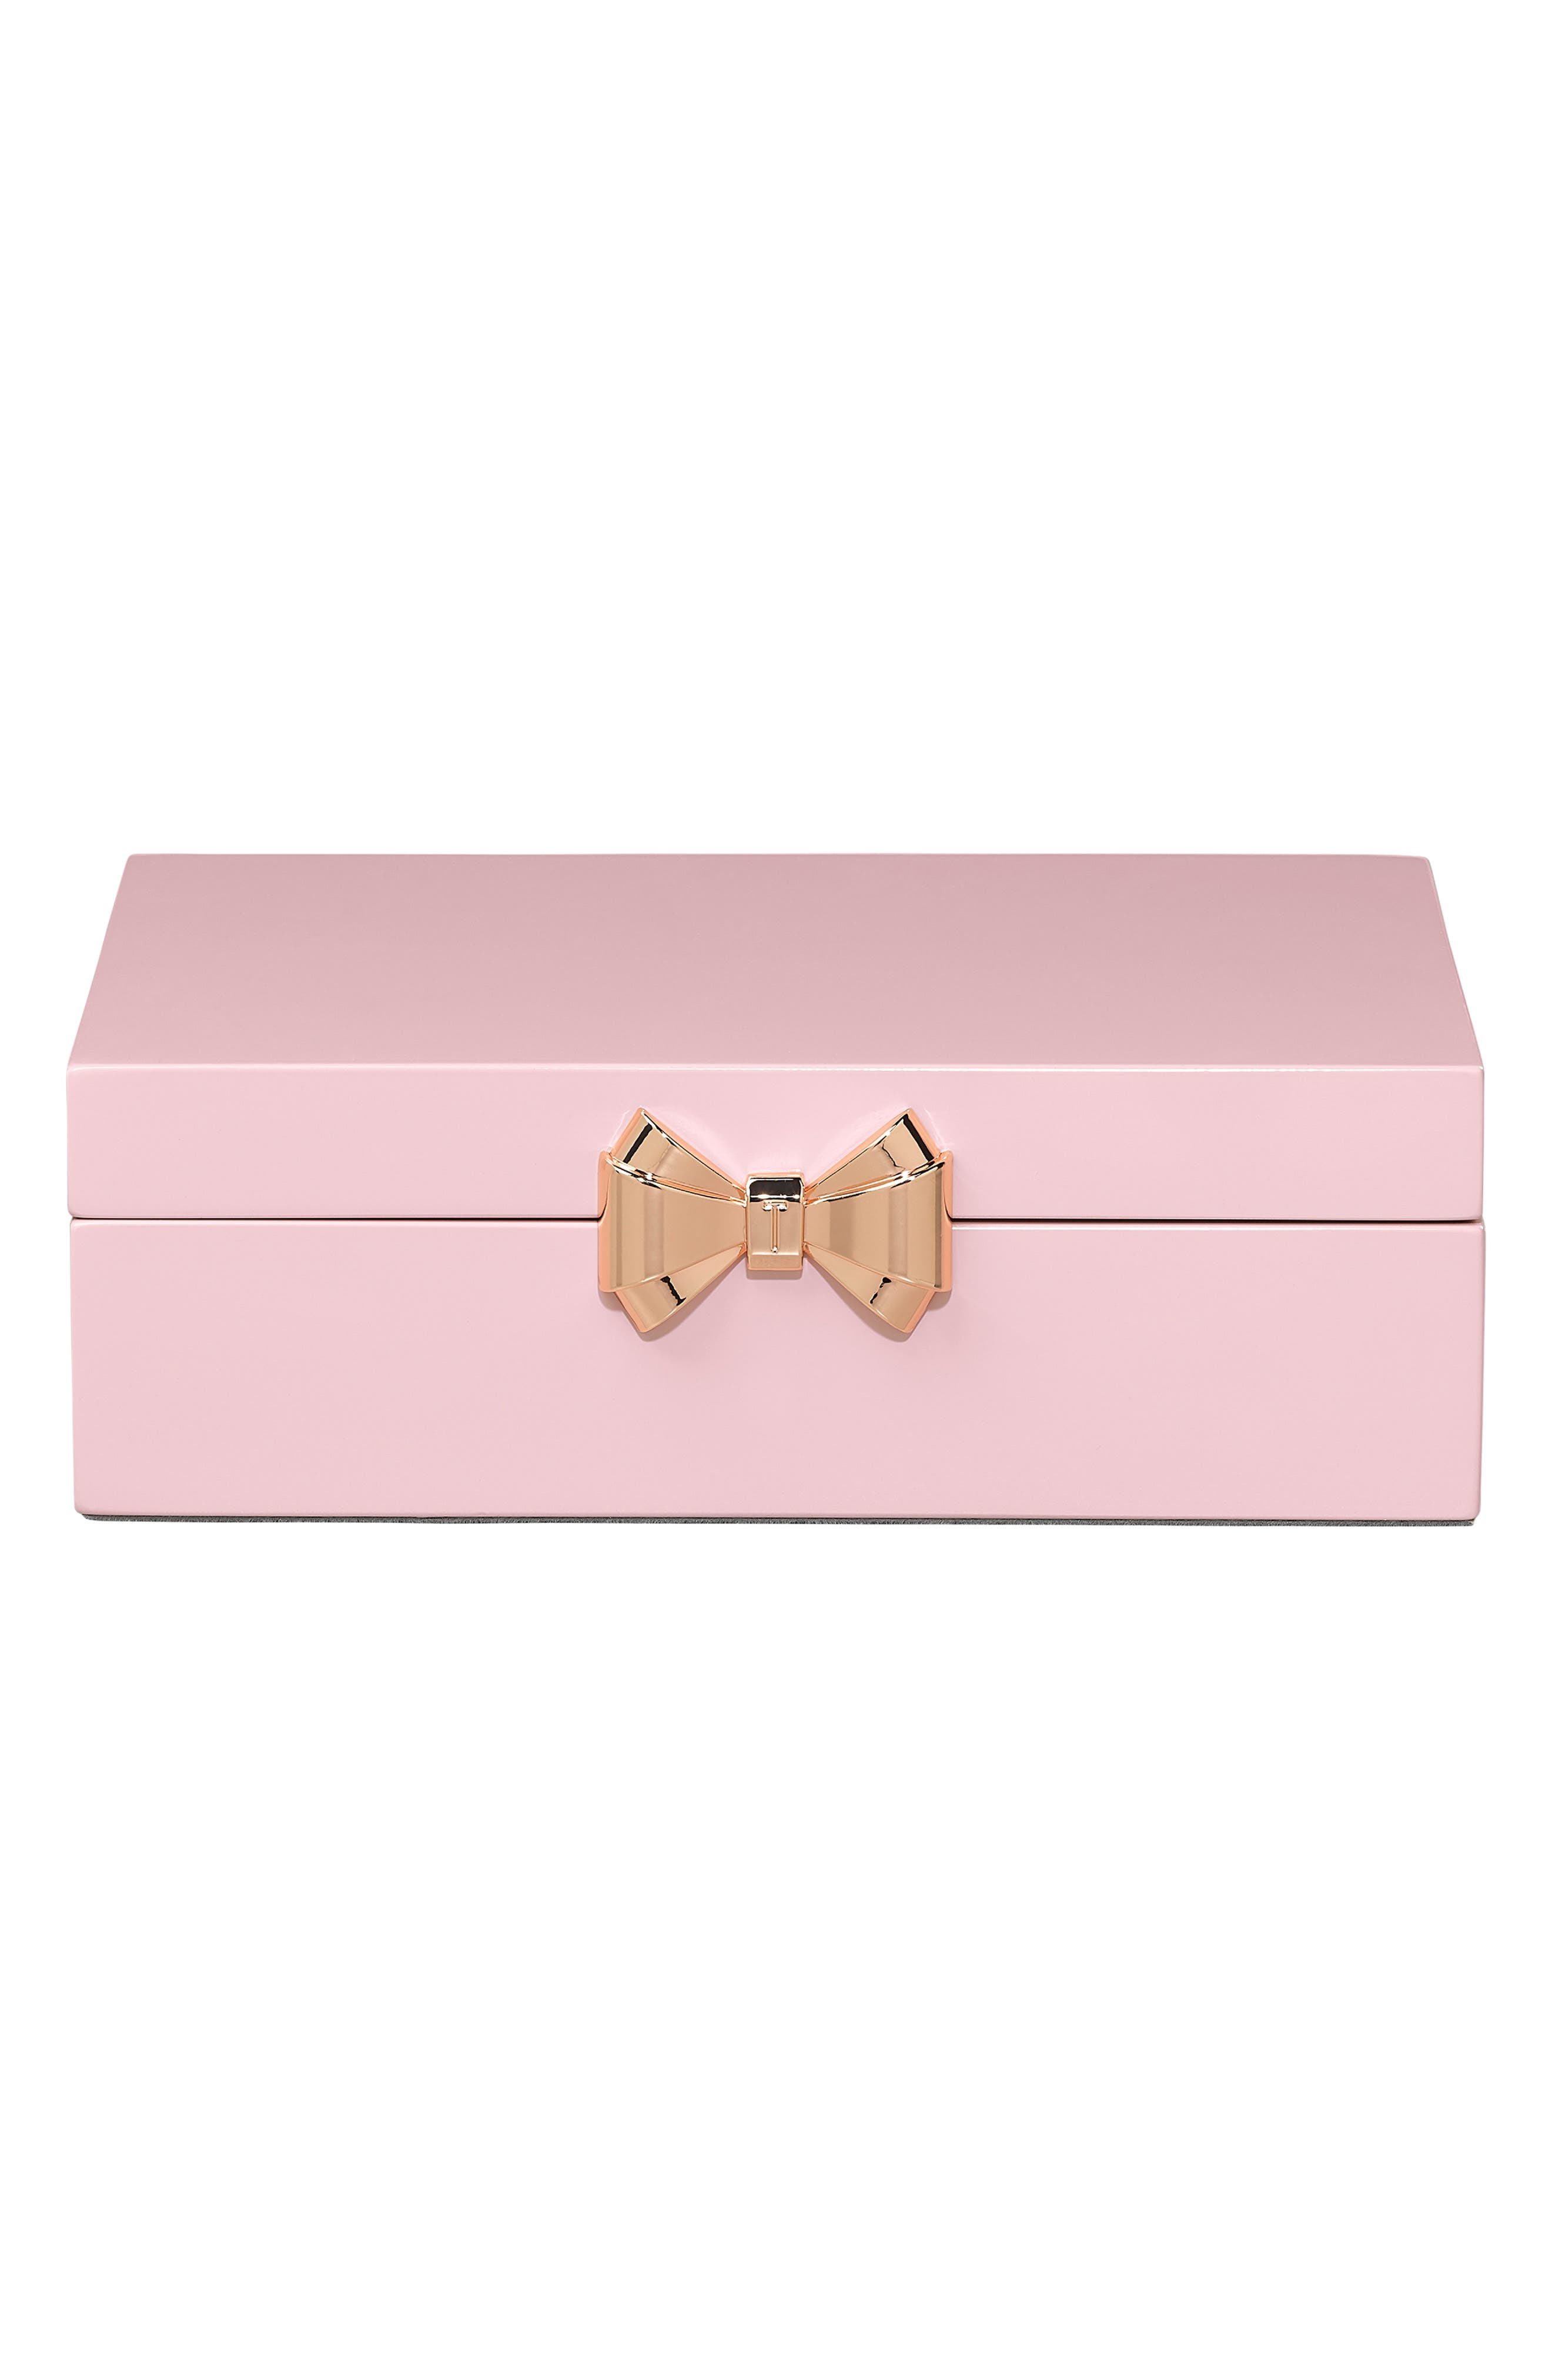 HINGED JEWELRY BOX - PINK